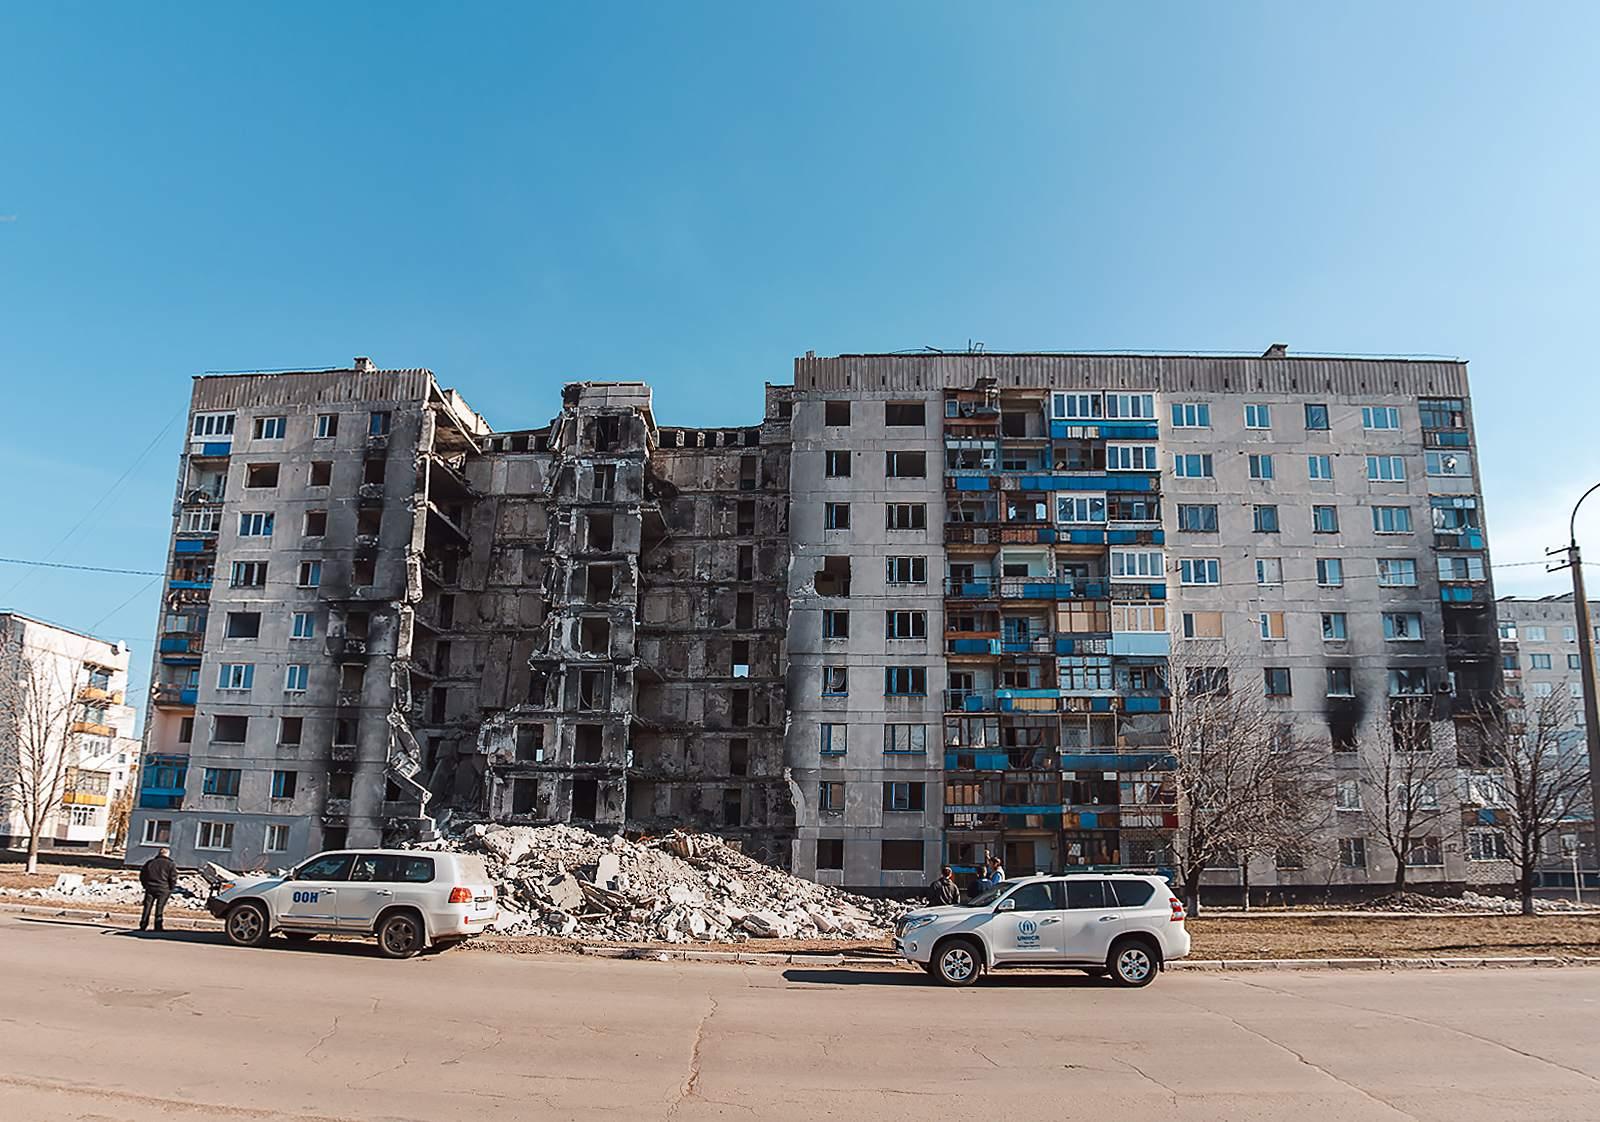 eastern ukraine Daily Reality in Eastern Ukraine